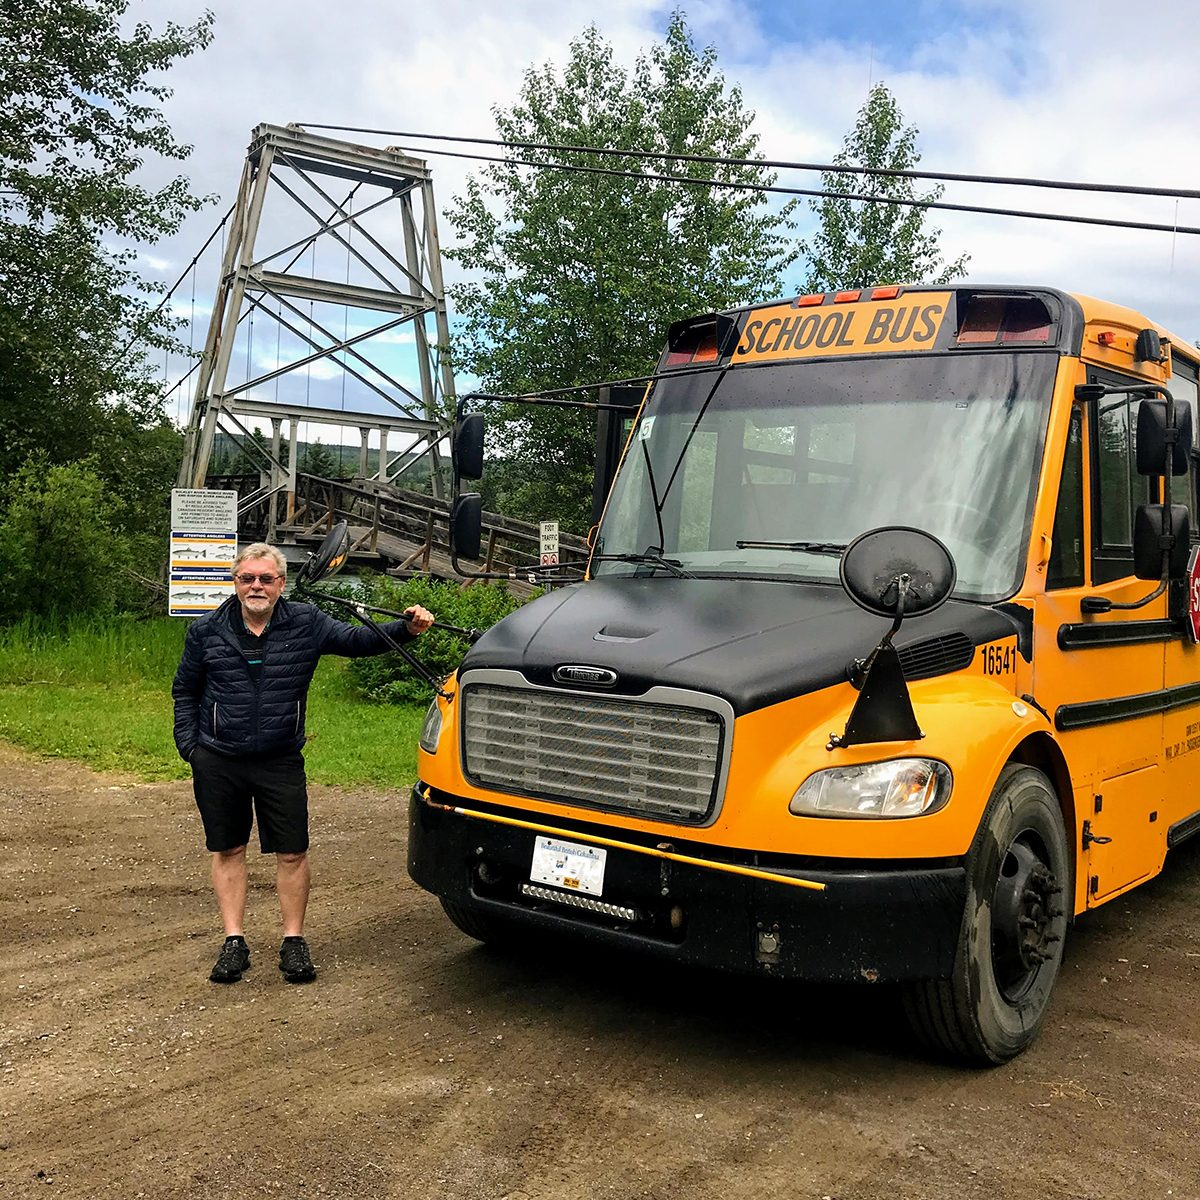 My Happy Place - School Bus